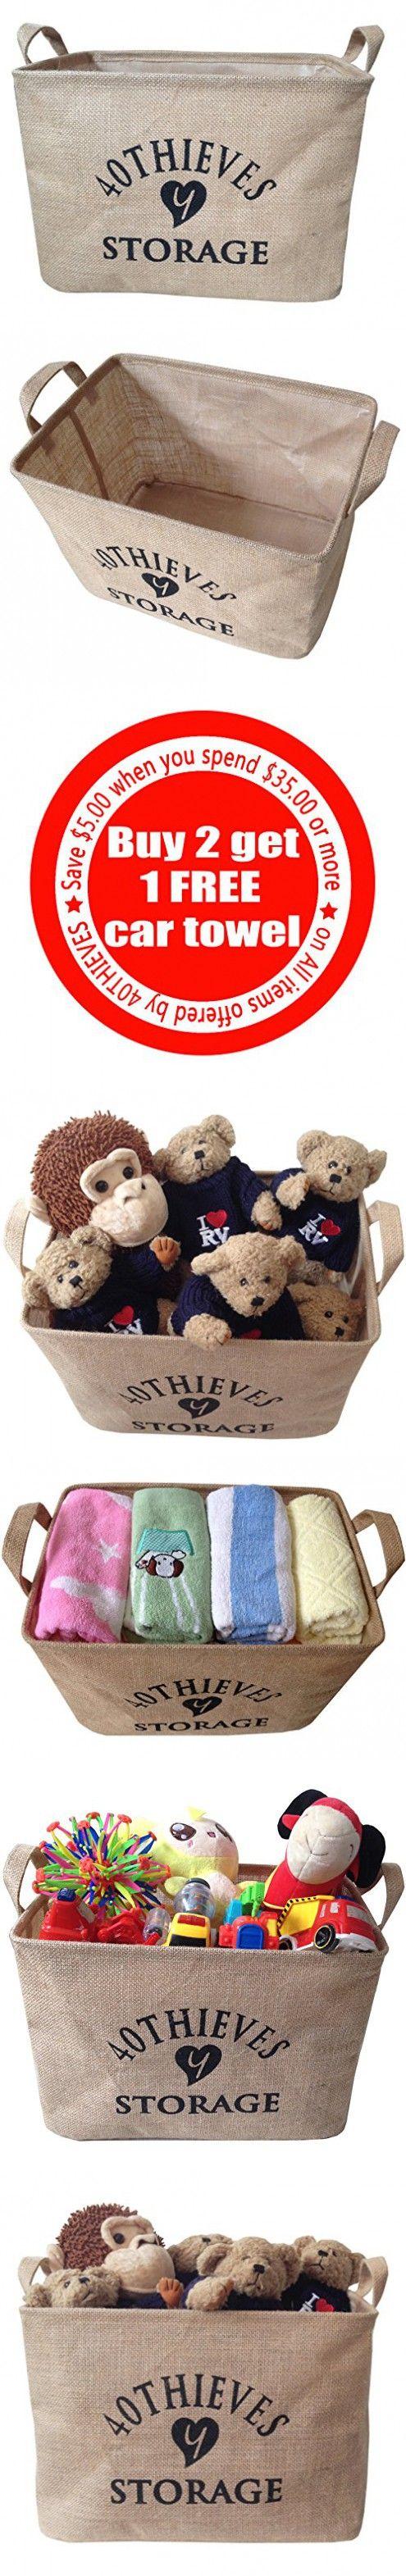 "Y 40 THIEVES Medium Jute Storage Bin 14.5 x 10 x 10"" perfect for Toy Storage - Storage Basket for Organizing Baby Clothing, Baby Toys, Kids Toys, Children Books, Gift Baskets"